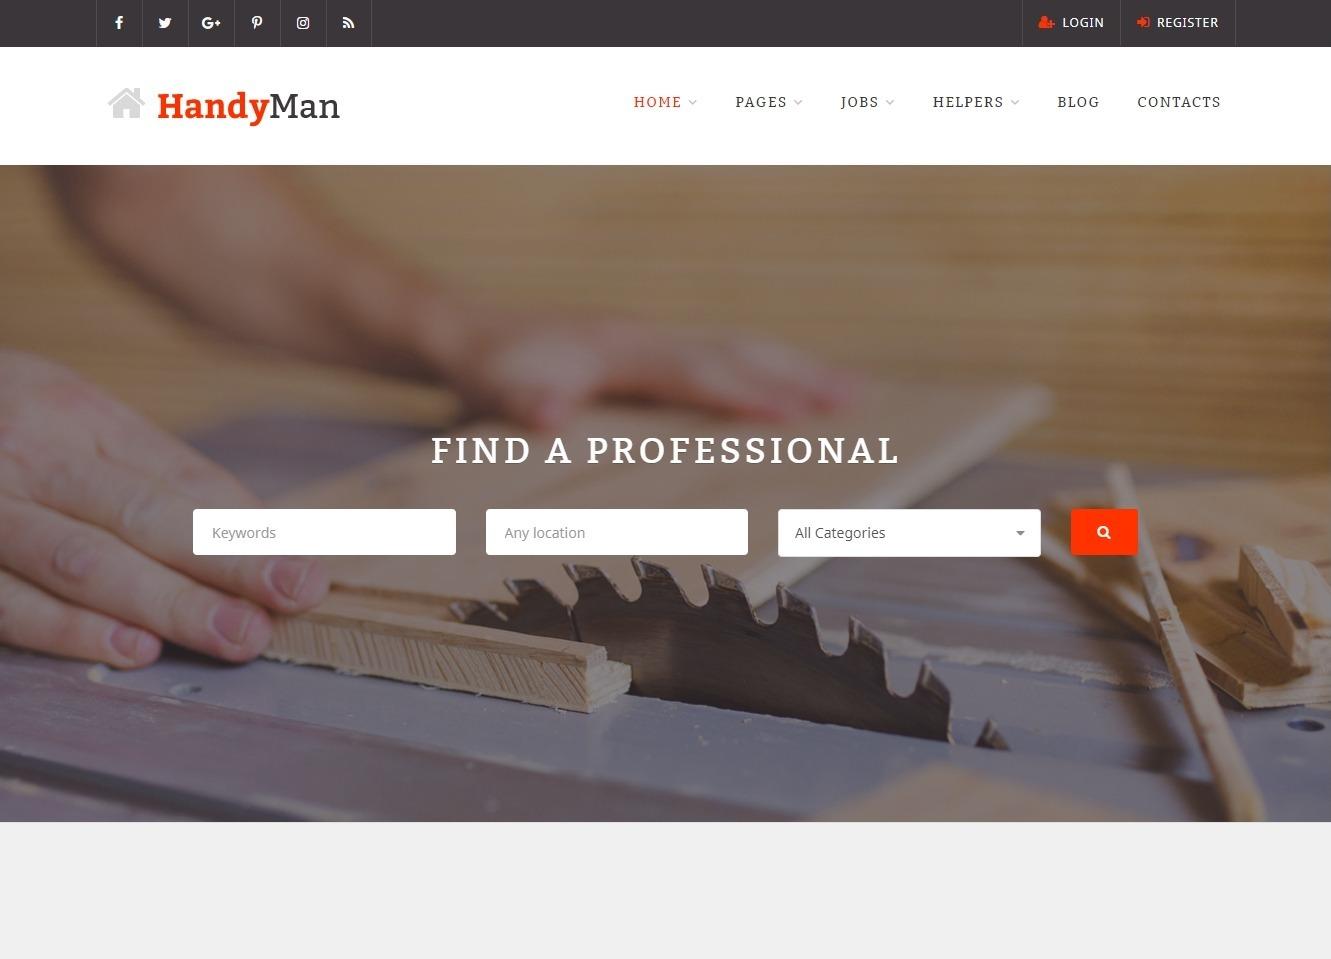 HandyMan Job Portal and Contracting Provider Search